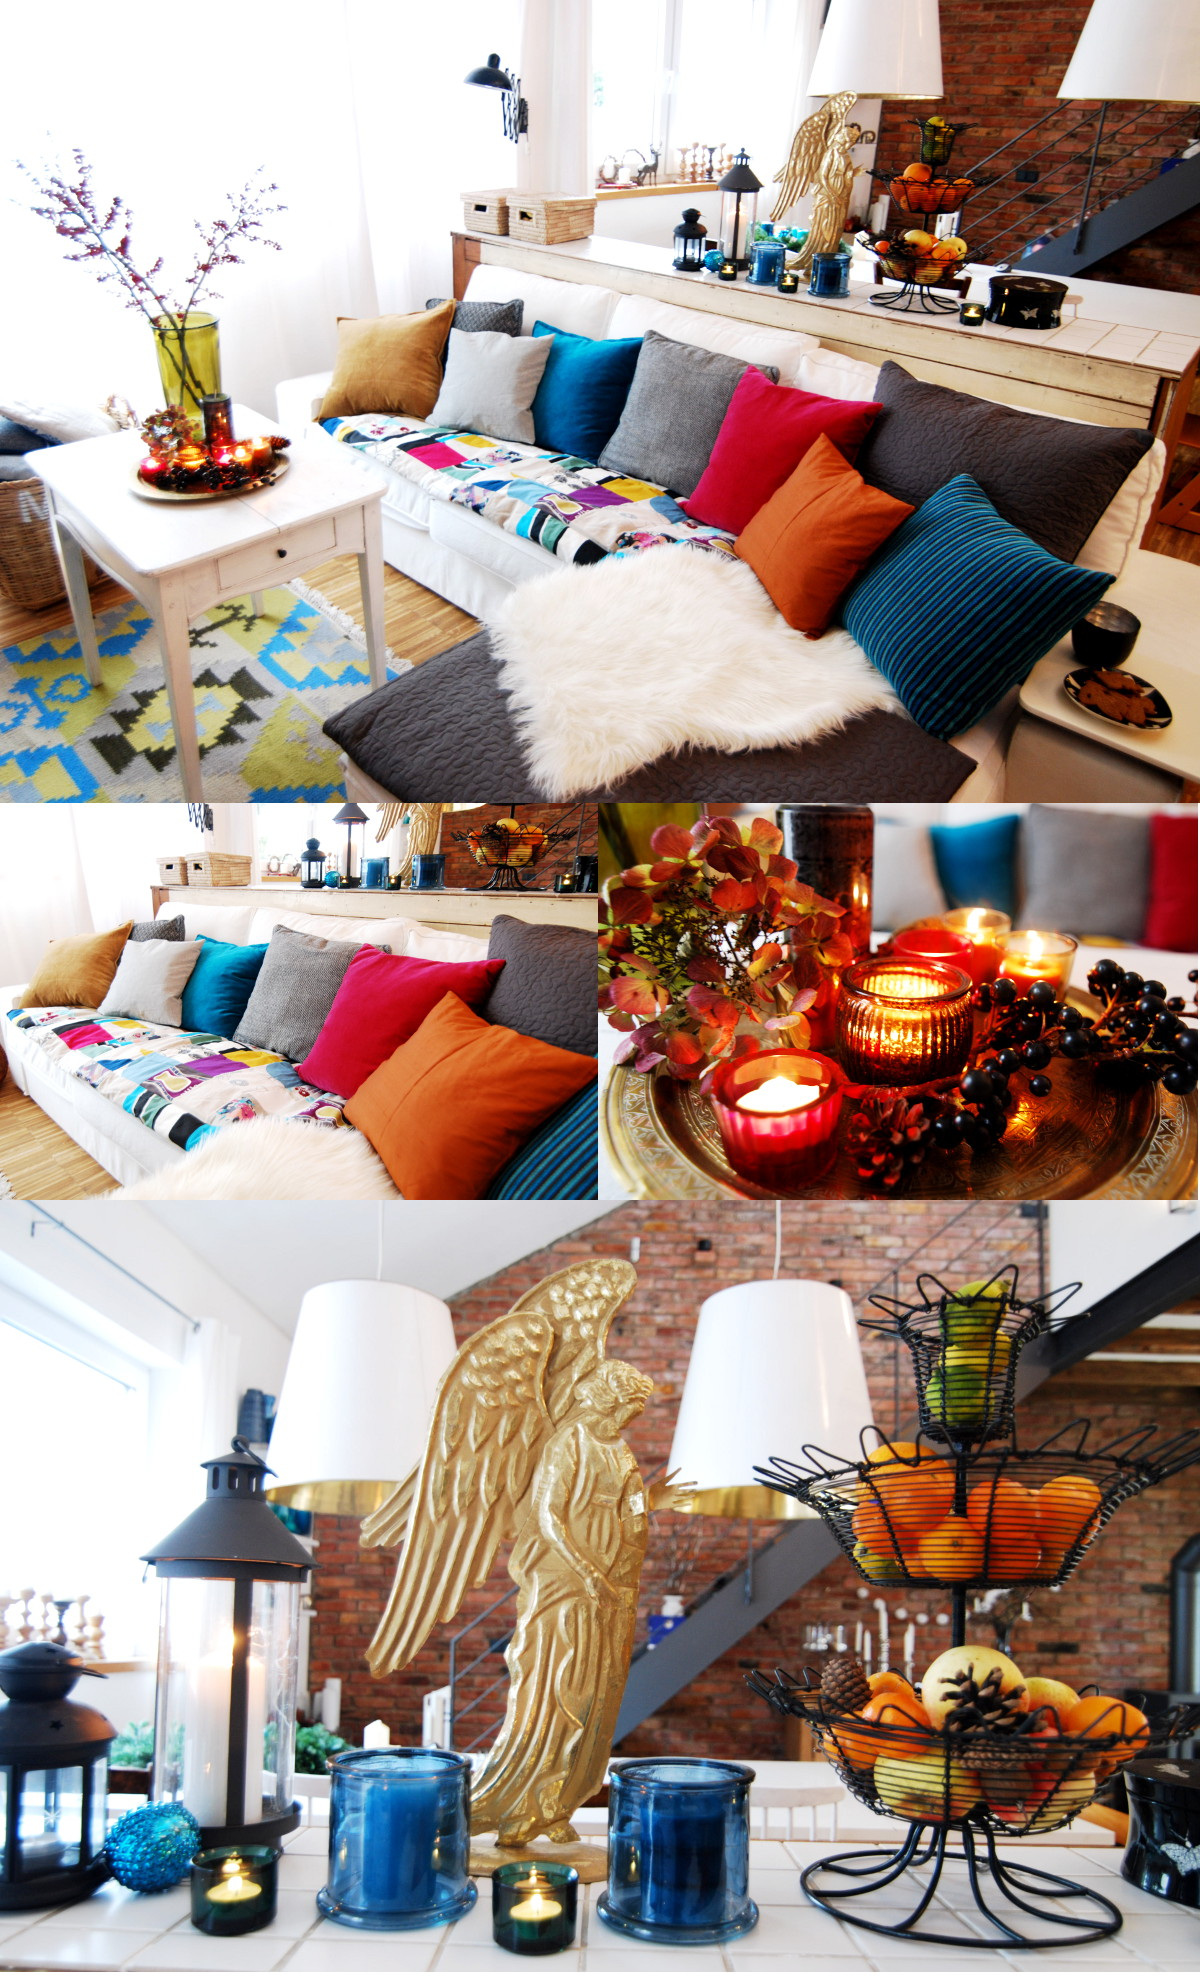 Winter Deko im Wohnzimmer - Leelah Loves